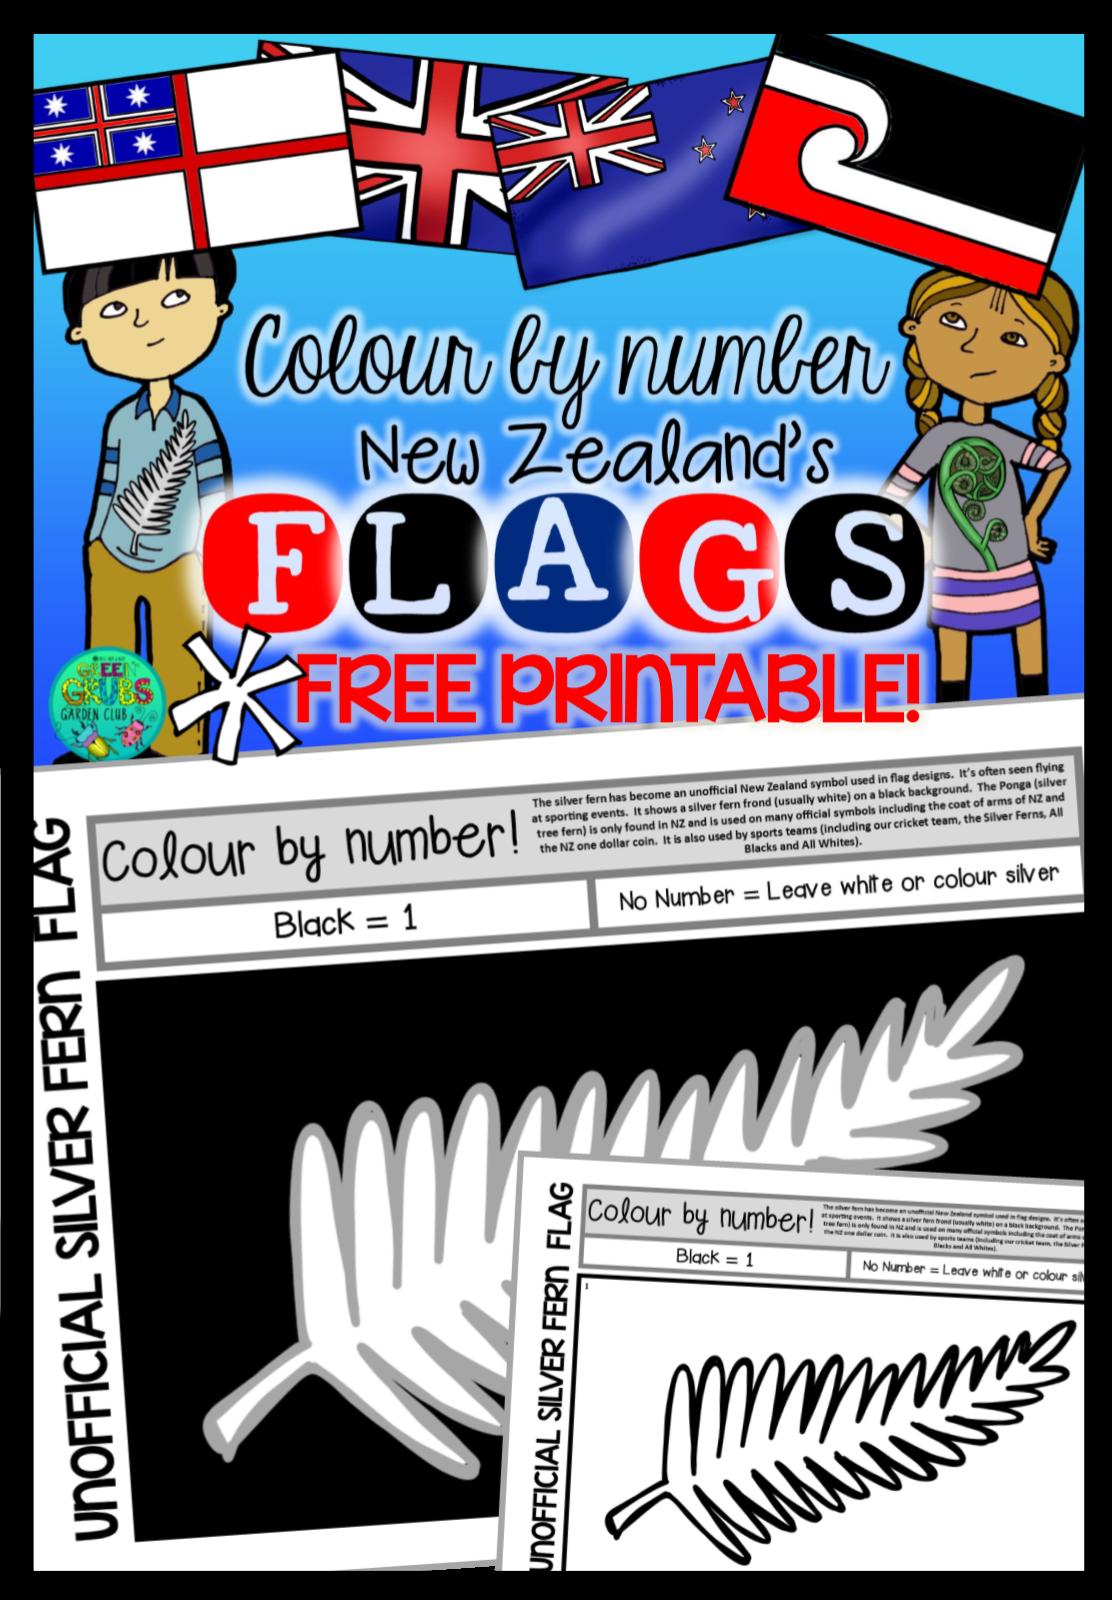 Green Grubs Garden Club Silver Fern Flag Template  FREE PRINTABLE